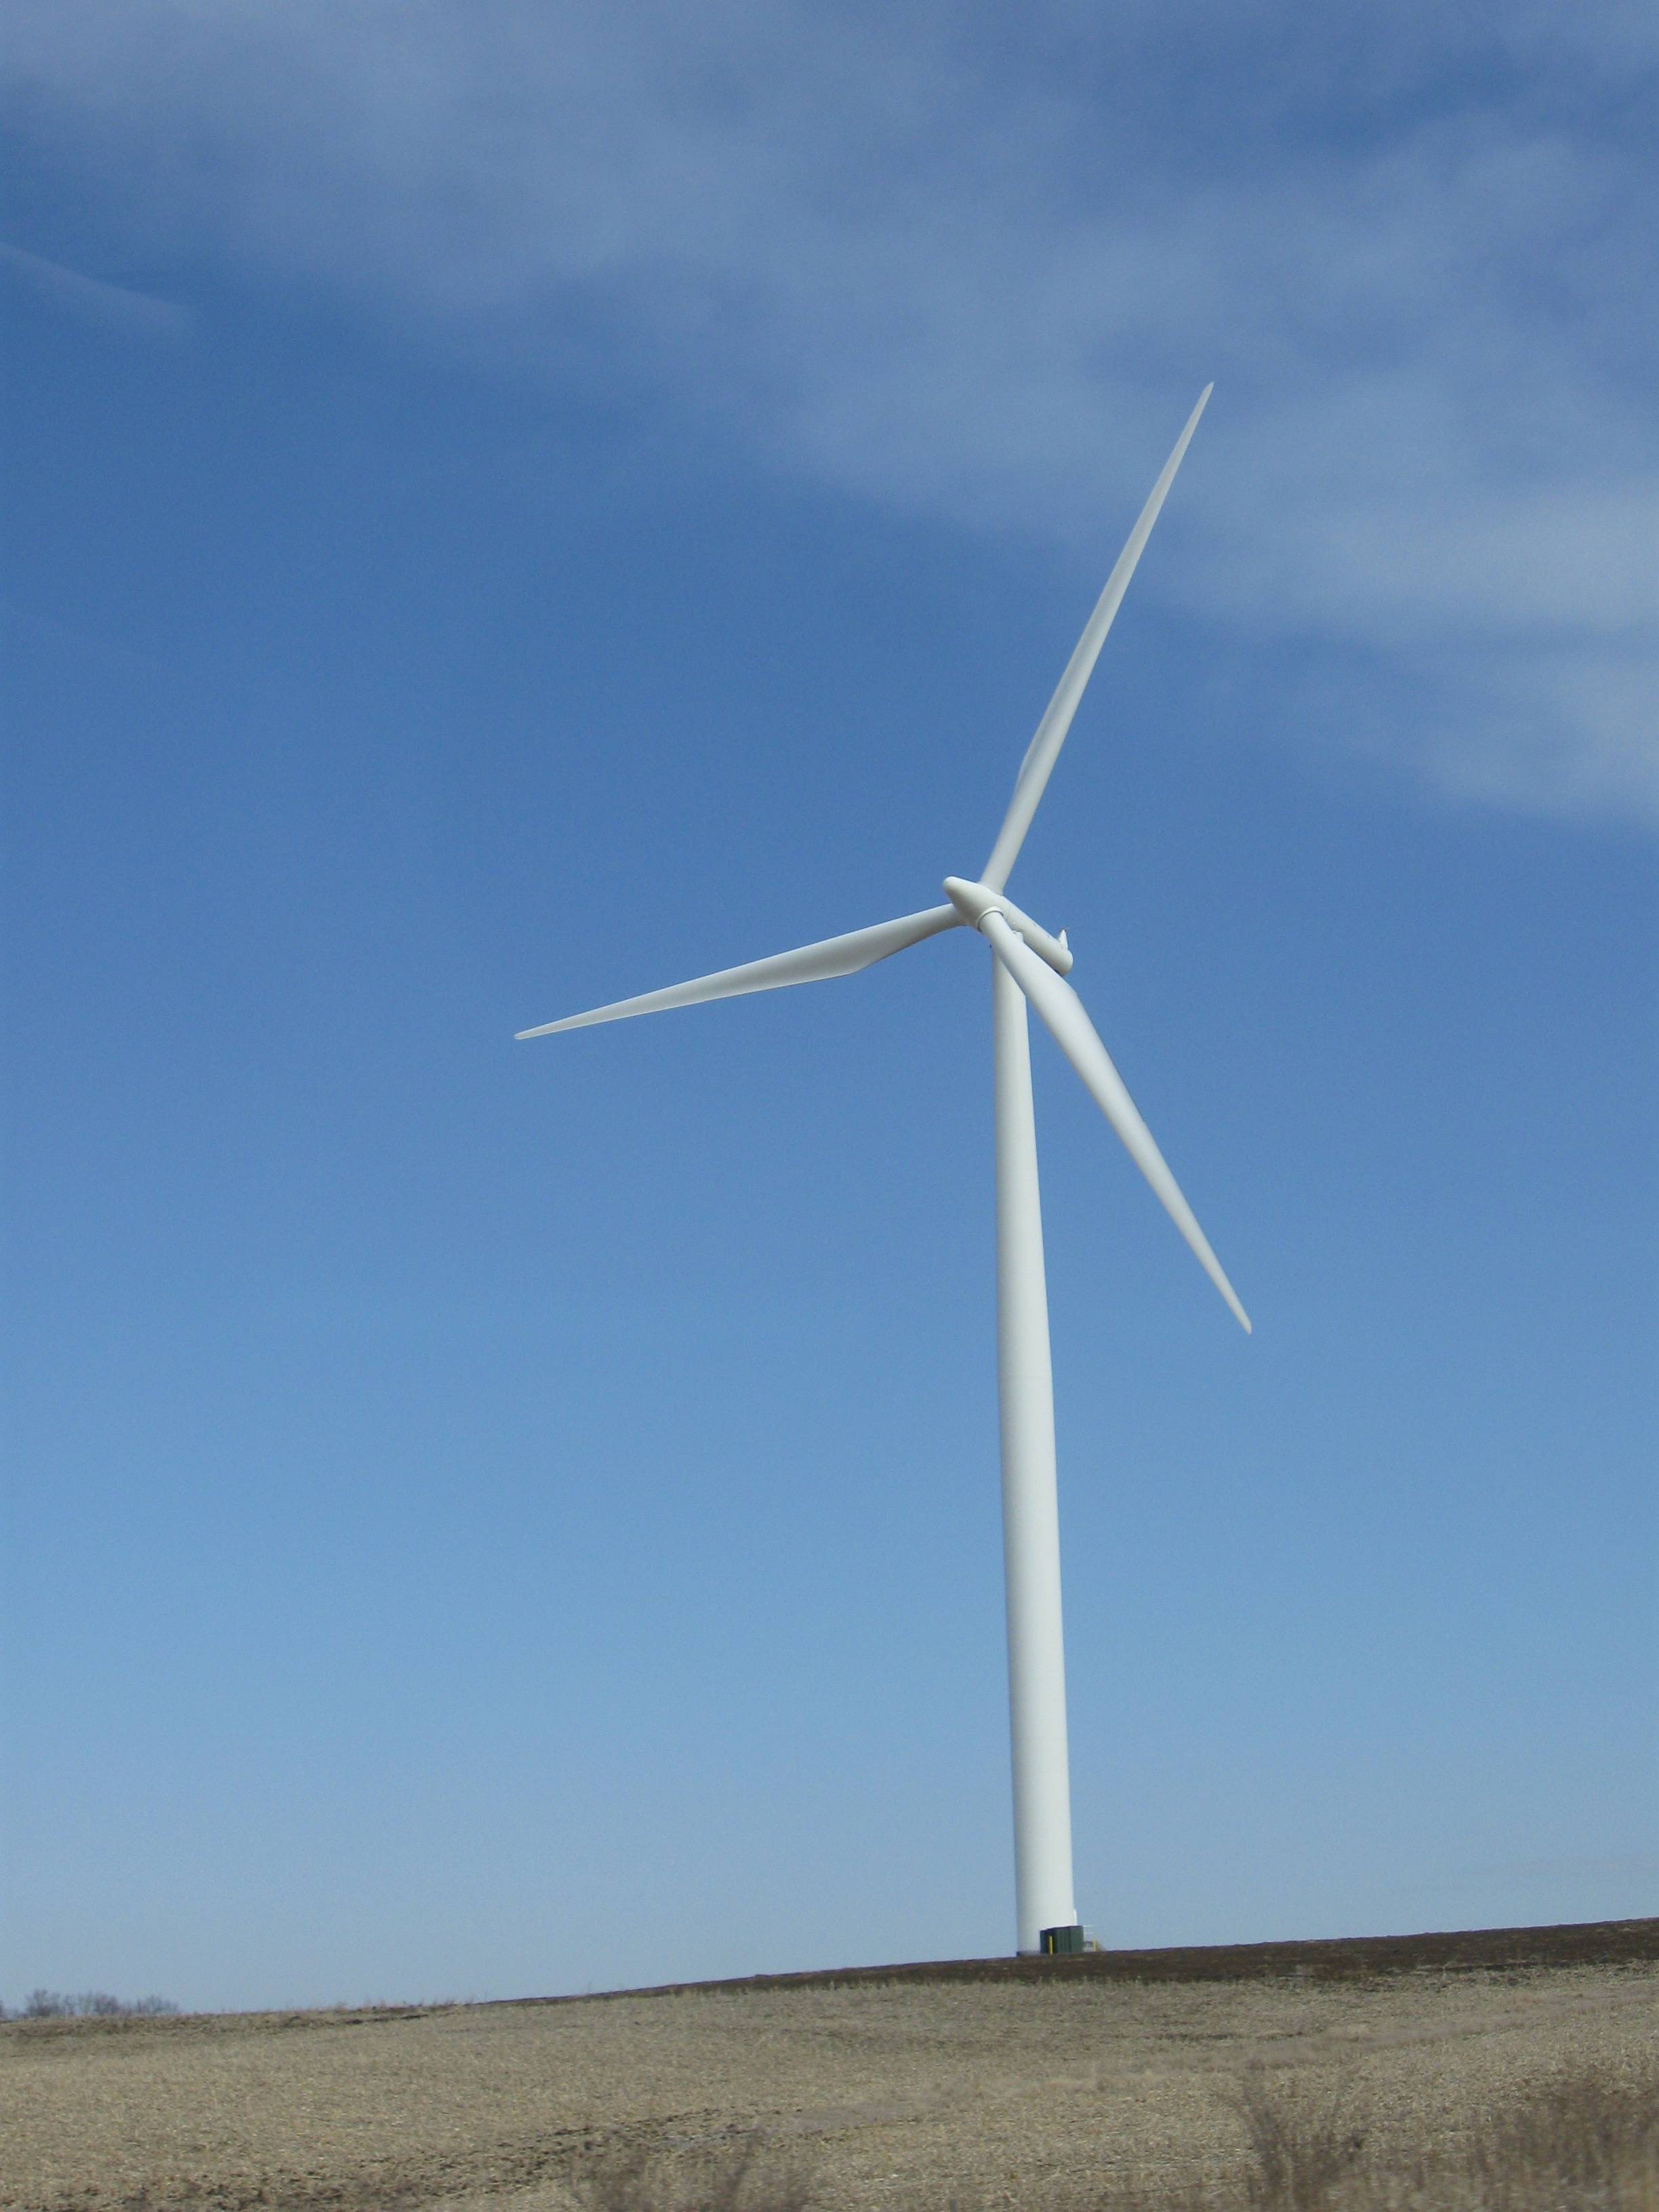 Iowa Wind Farms File:wind Turbine Walnut Iowa